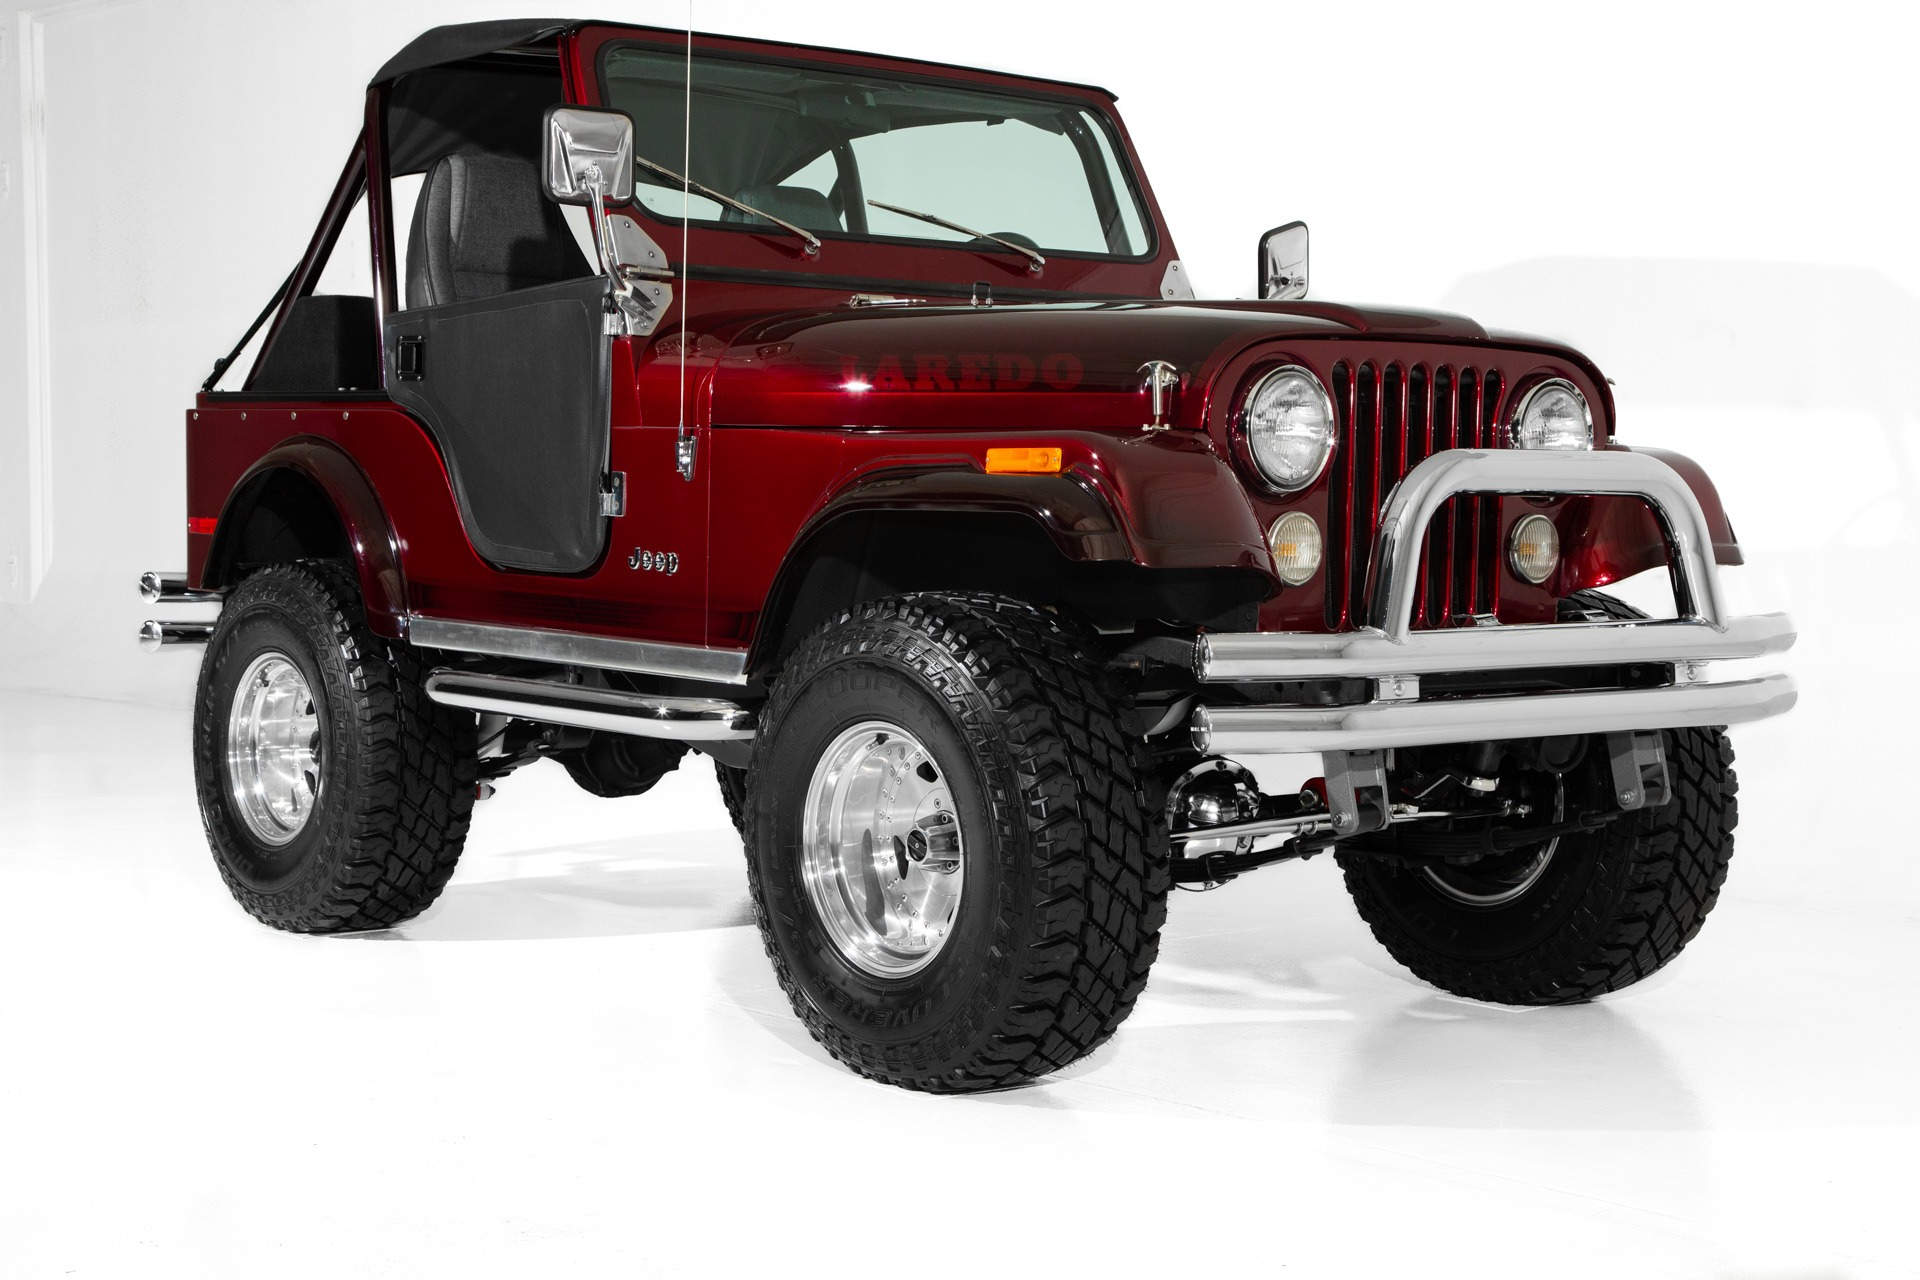 hight resolution of 1978 jeep cj5 brandywine show jeep v8